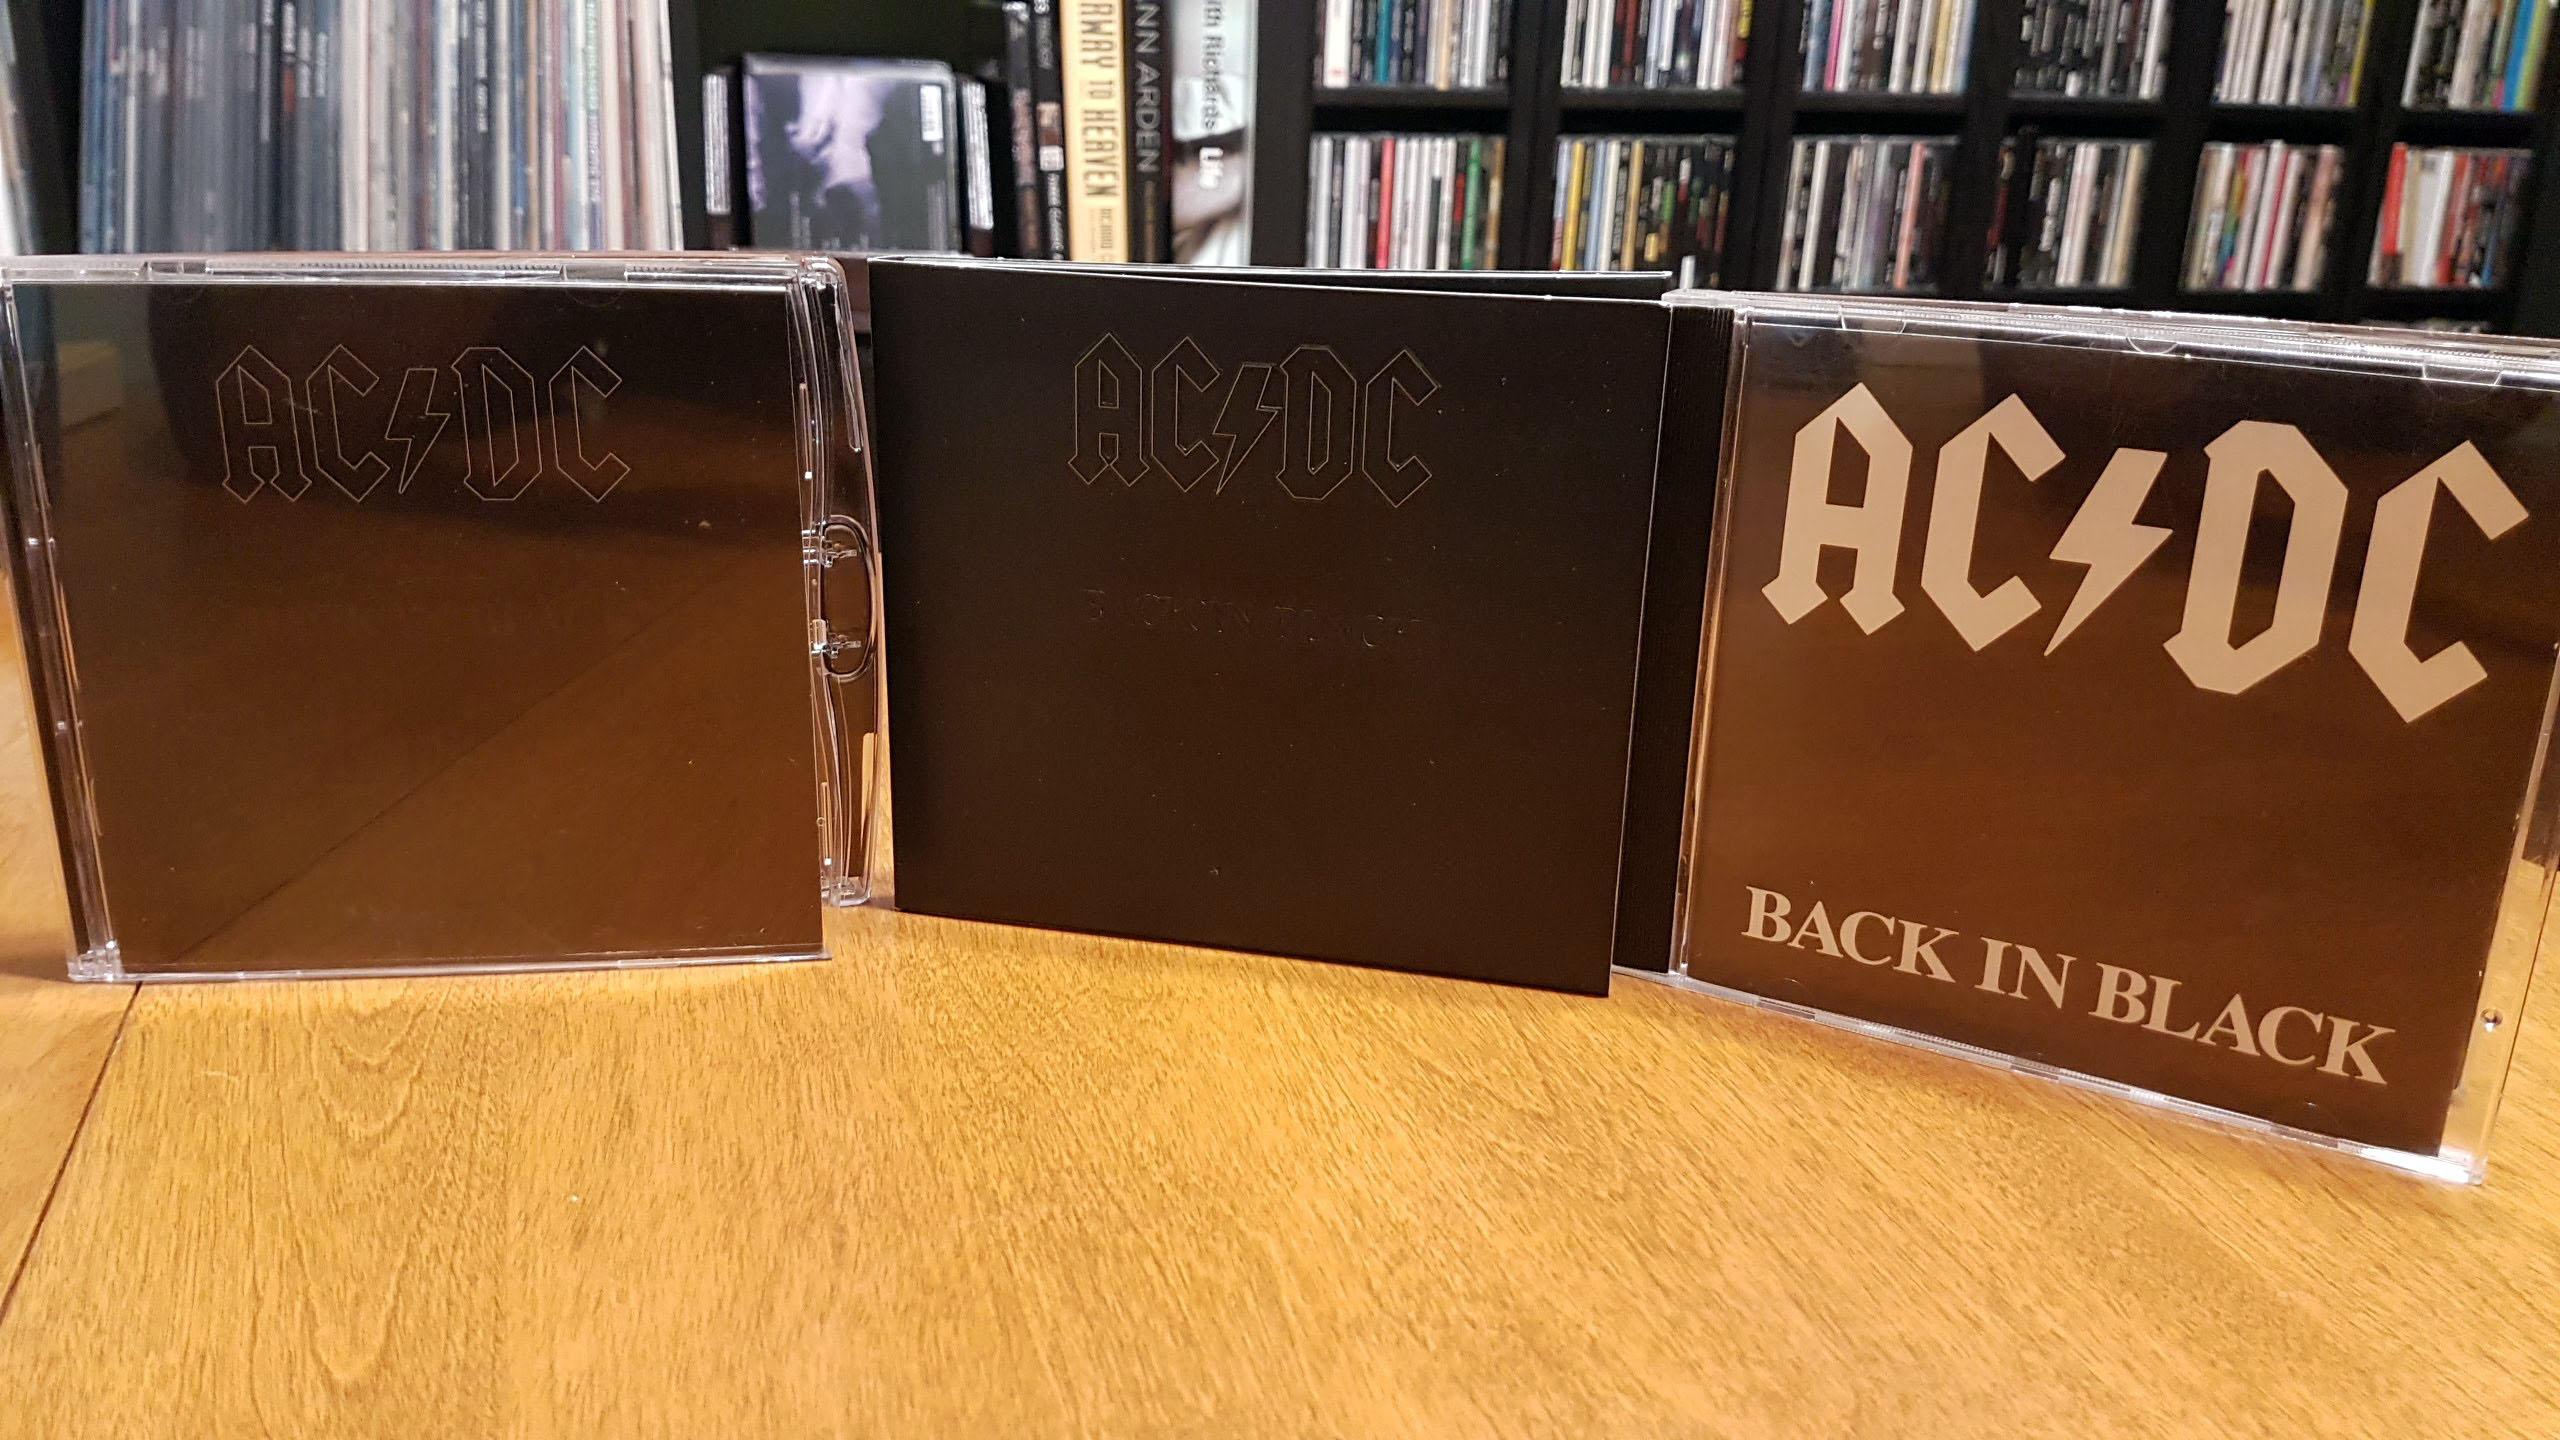 back in black dualdisc lineup